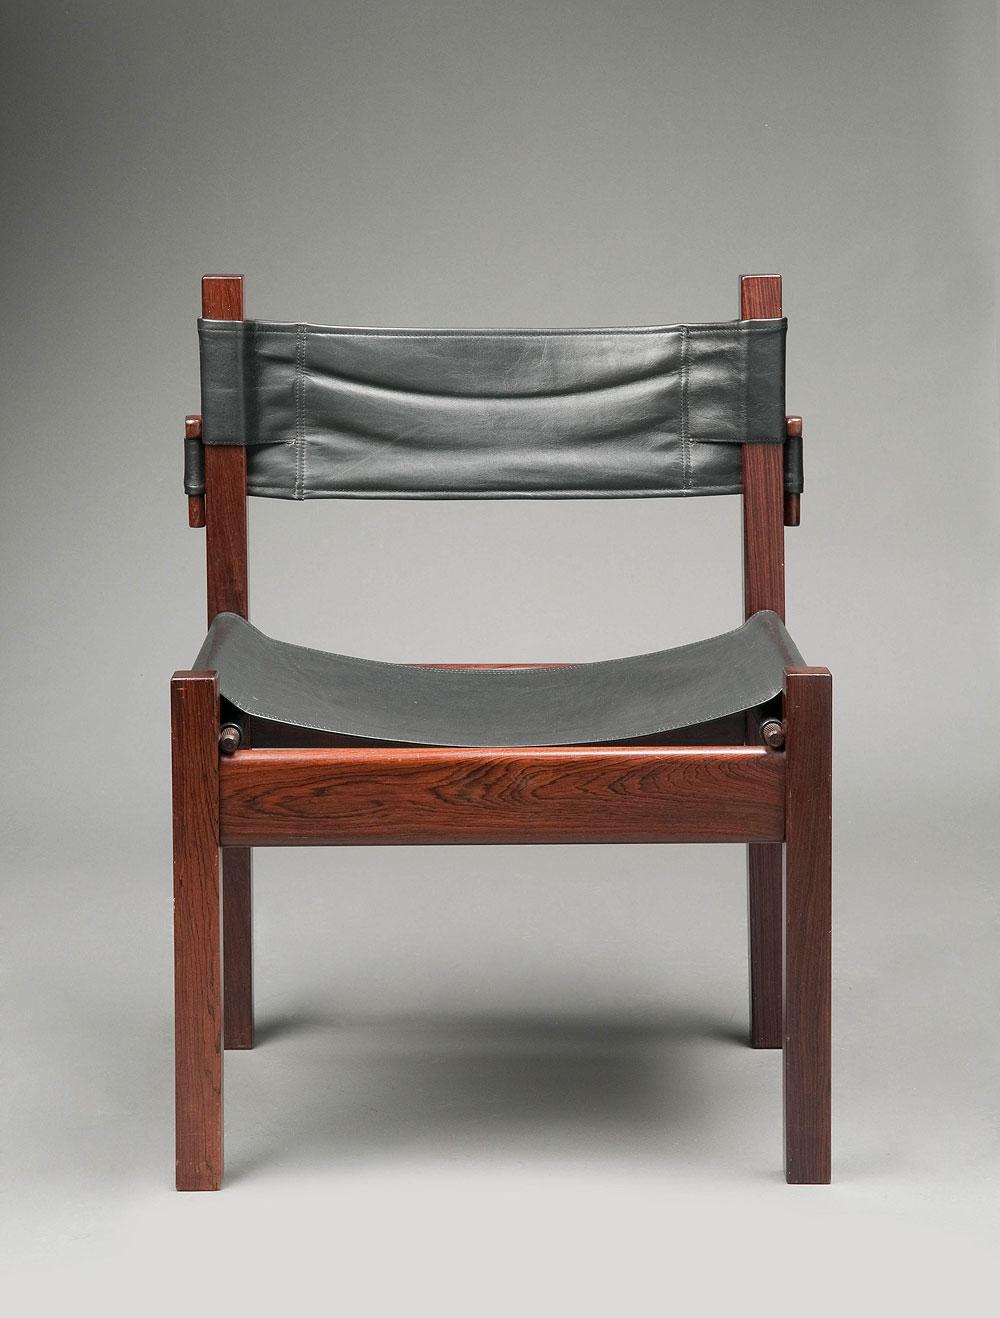 António-Garcia-Cadeira-Osaka (MUDE.P.0739) ©PH3